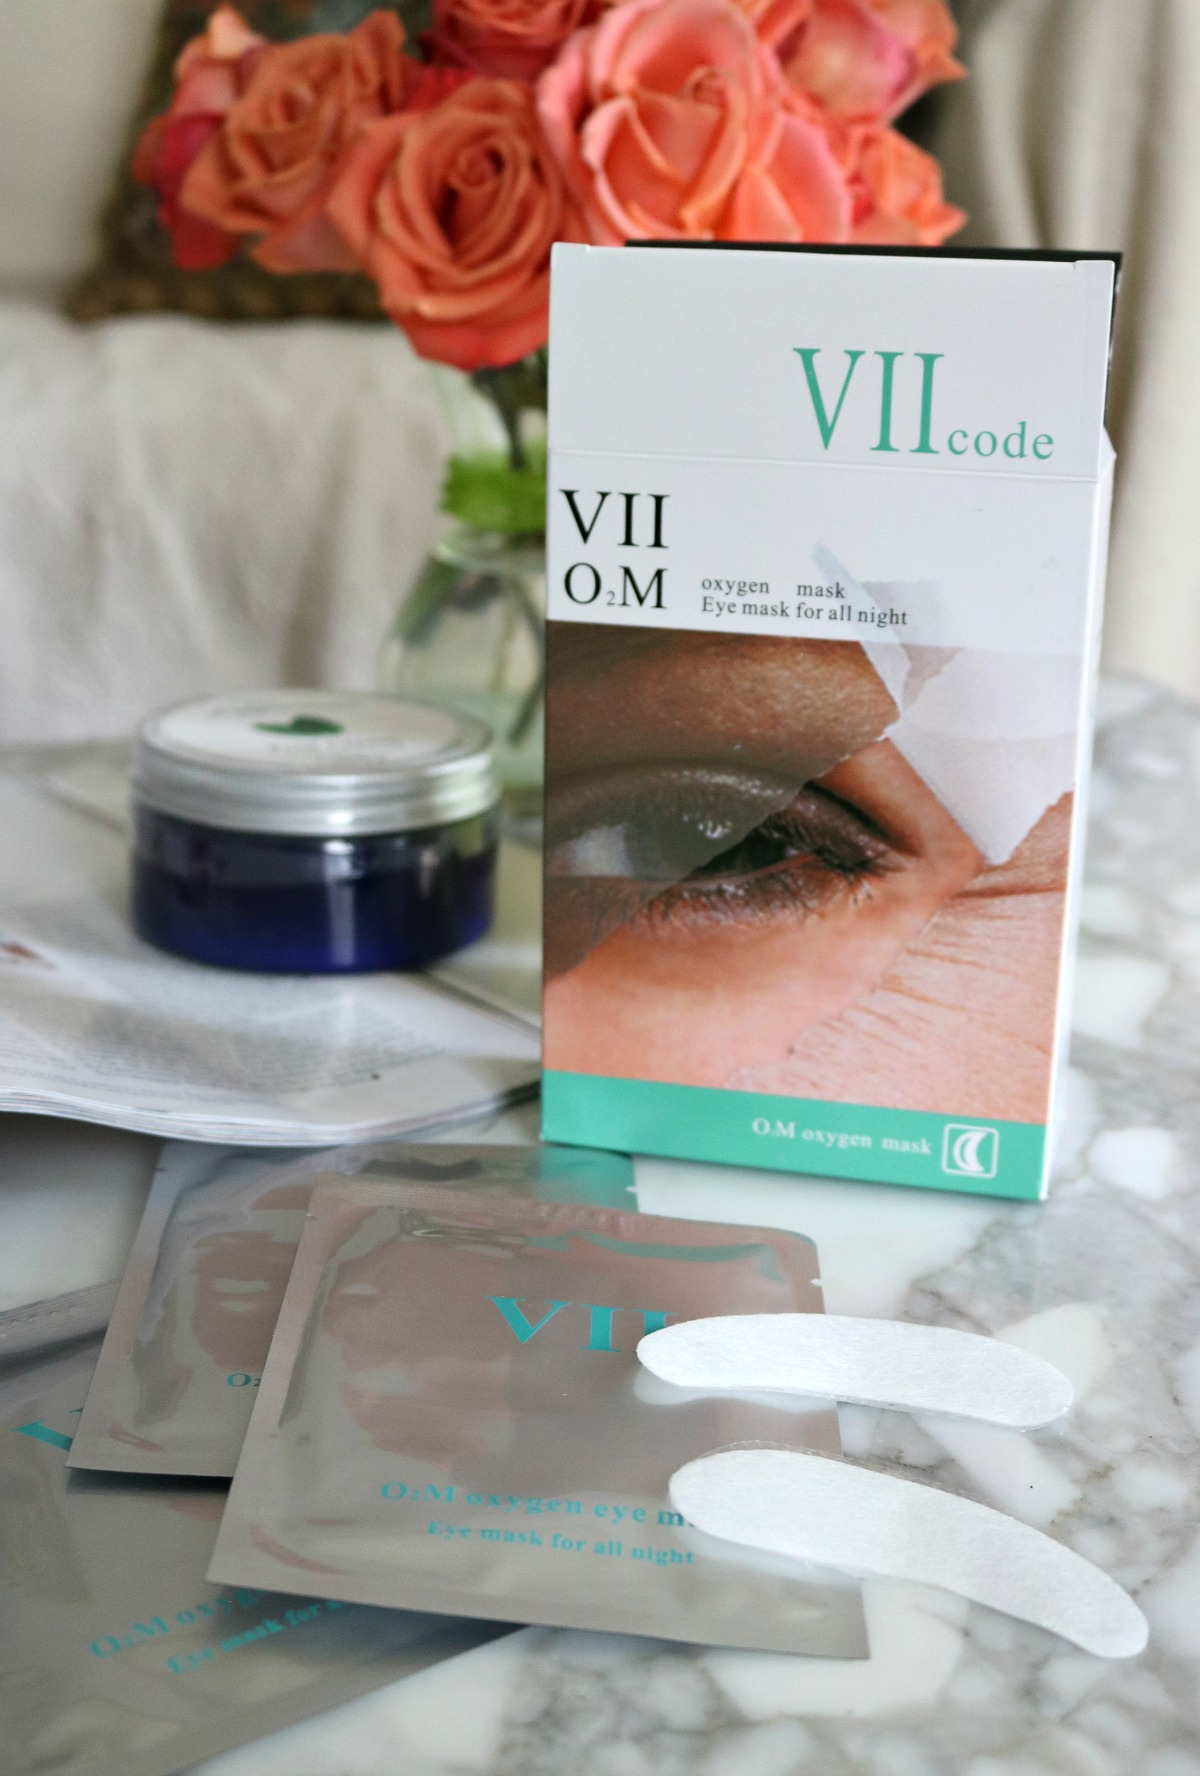 VIIcode Eye Masks help you beautify your eyes overnight. #Skincare #VIIcode